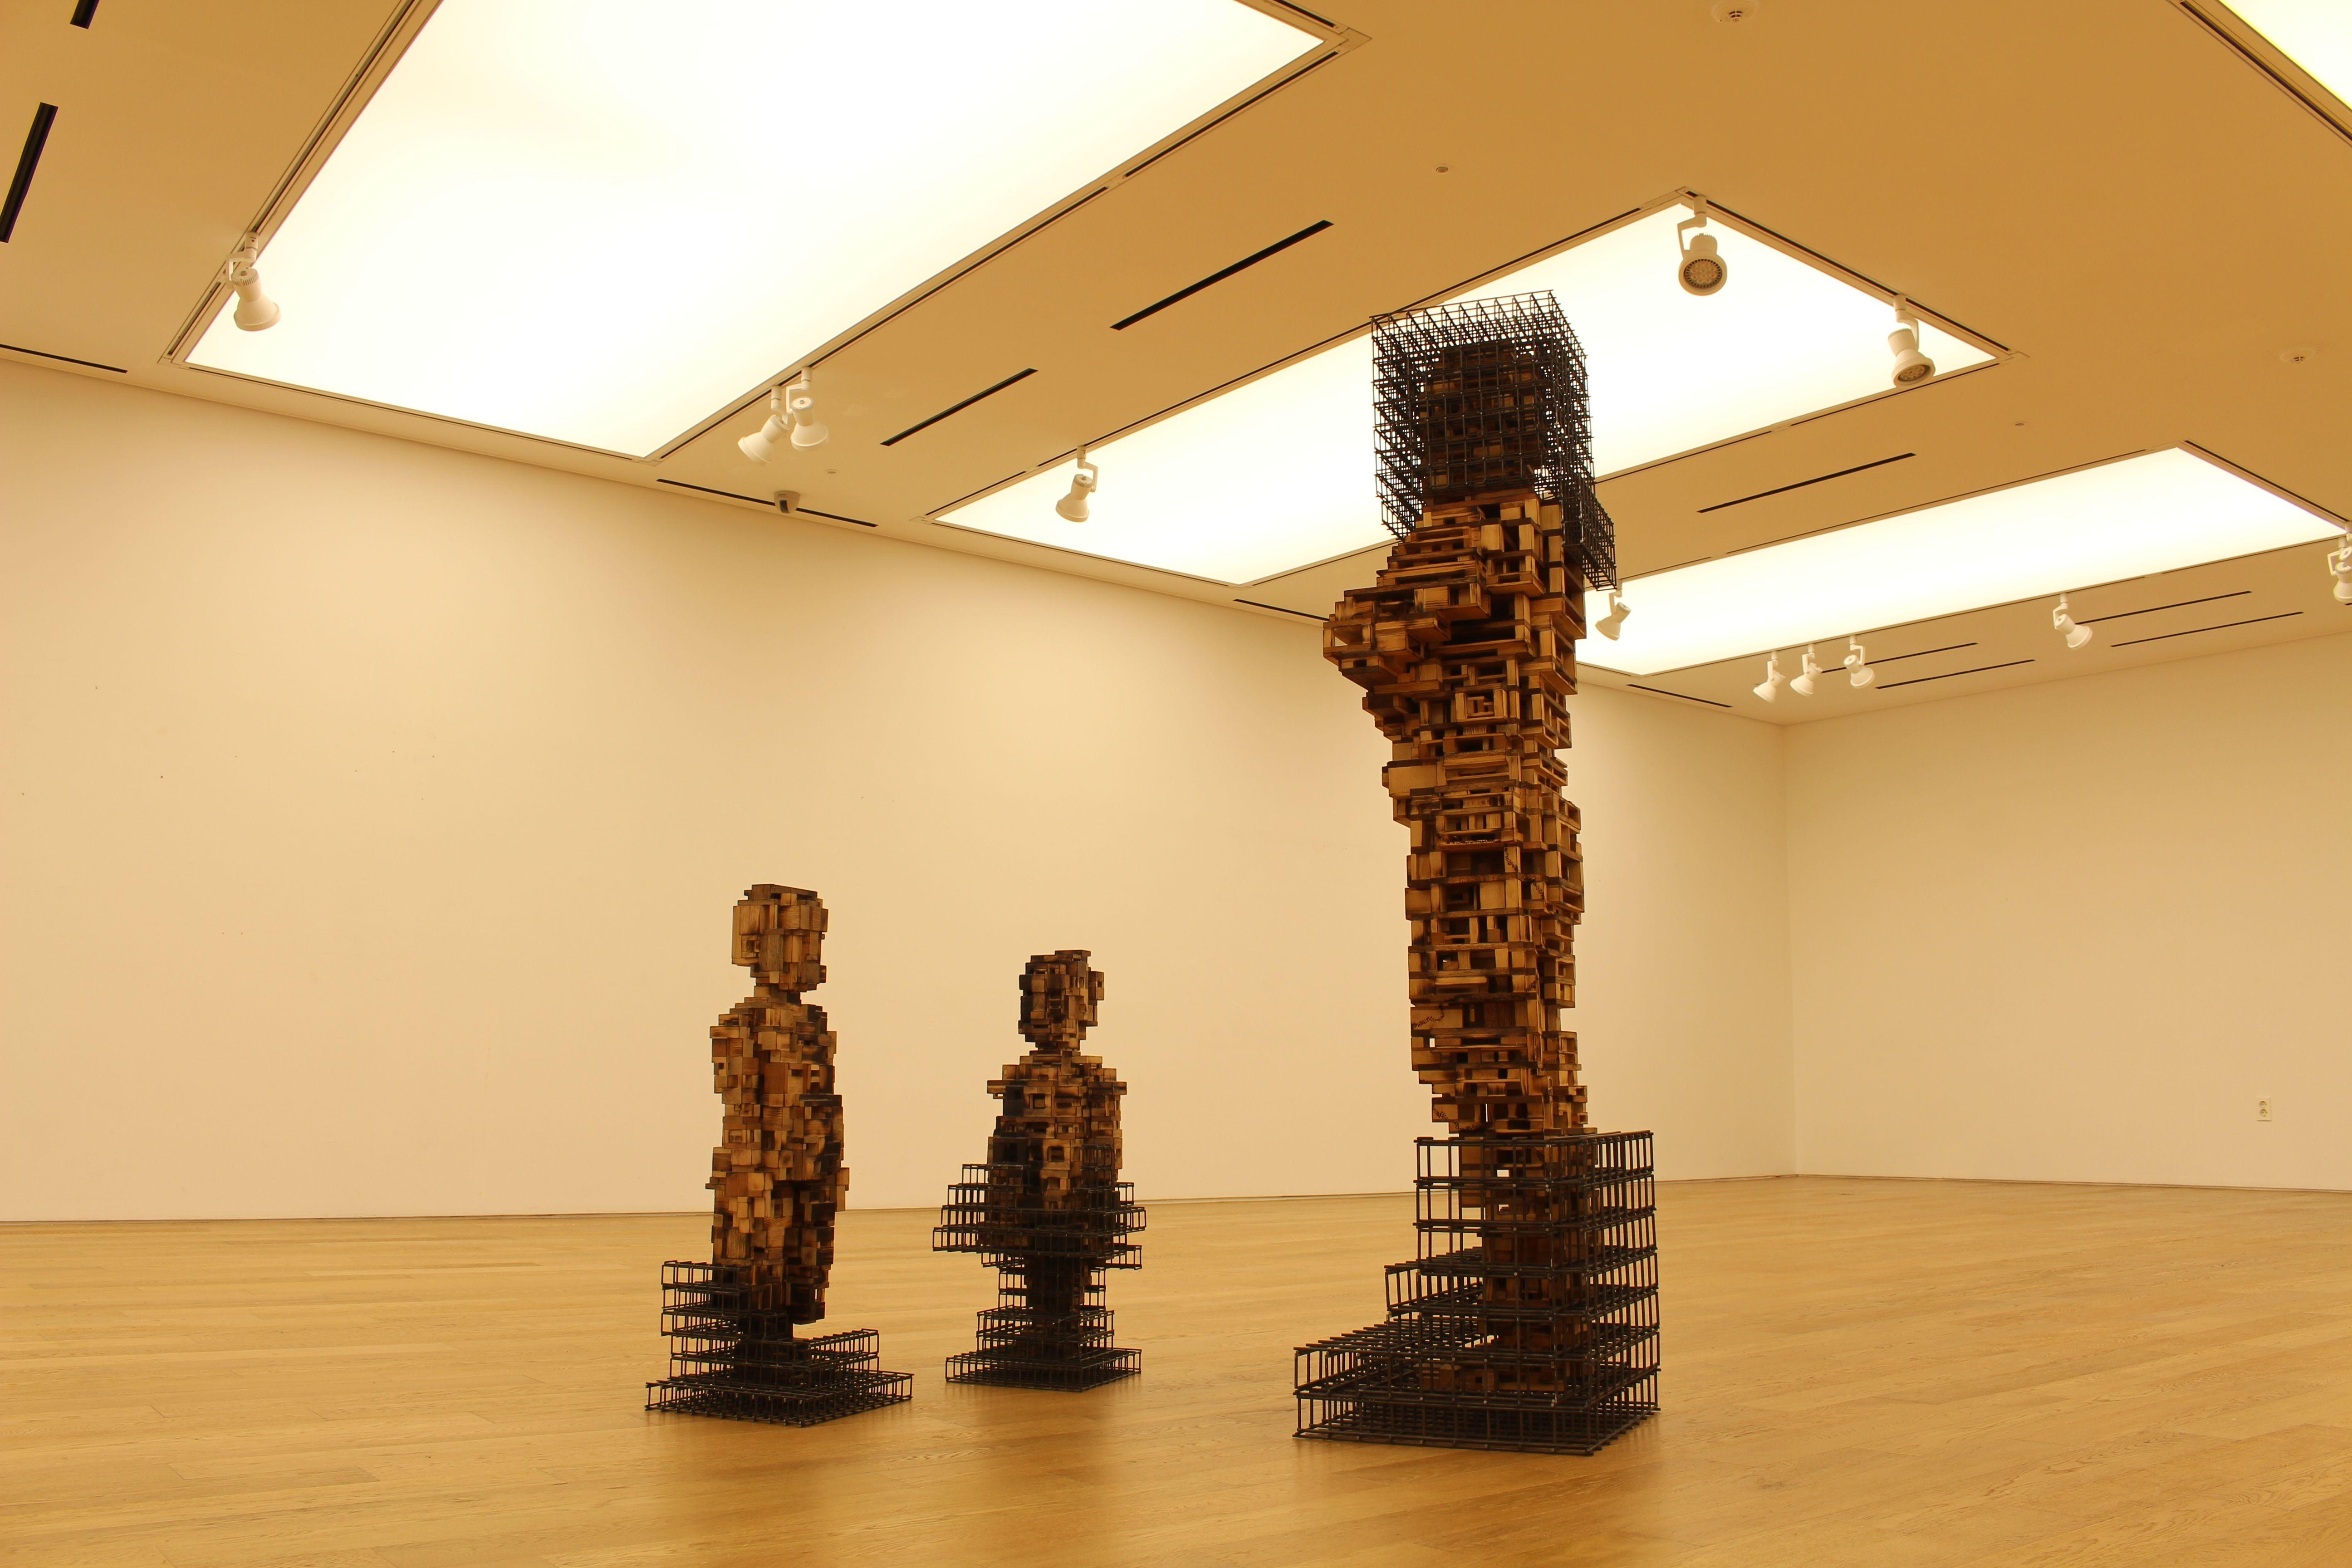 Build life #1_wood,mesh steel_100x100x170(cm)/sculpture,wood,architecture,contemporary art,installation